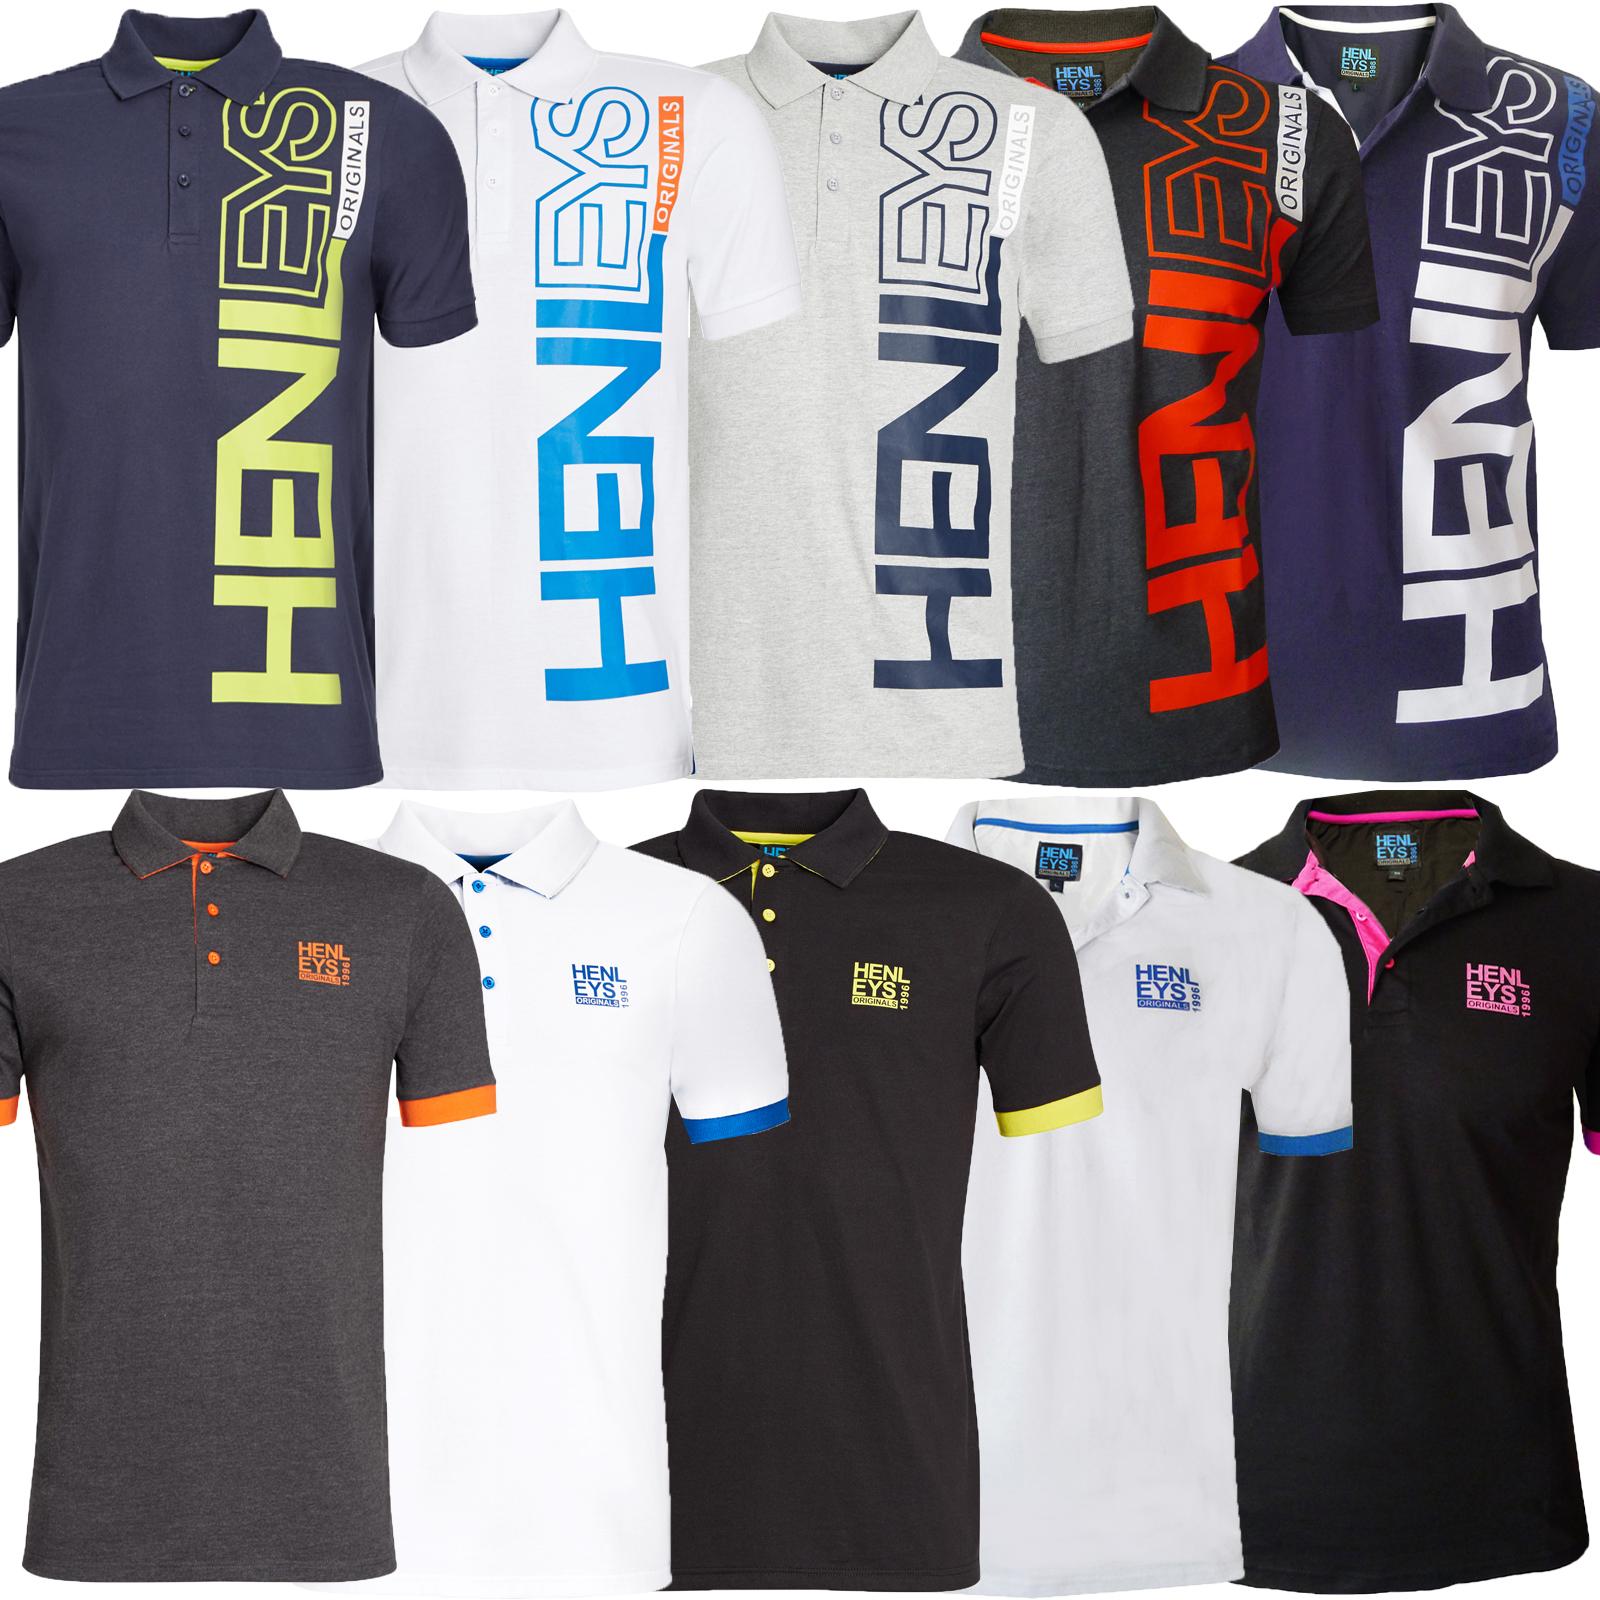 T Shirt Design Maker Sports « Alzheimer's Network of Oregon